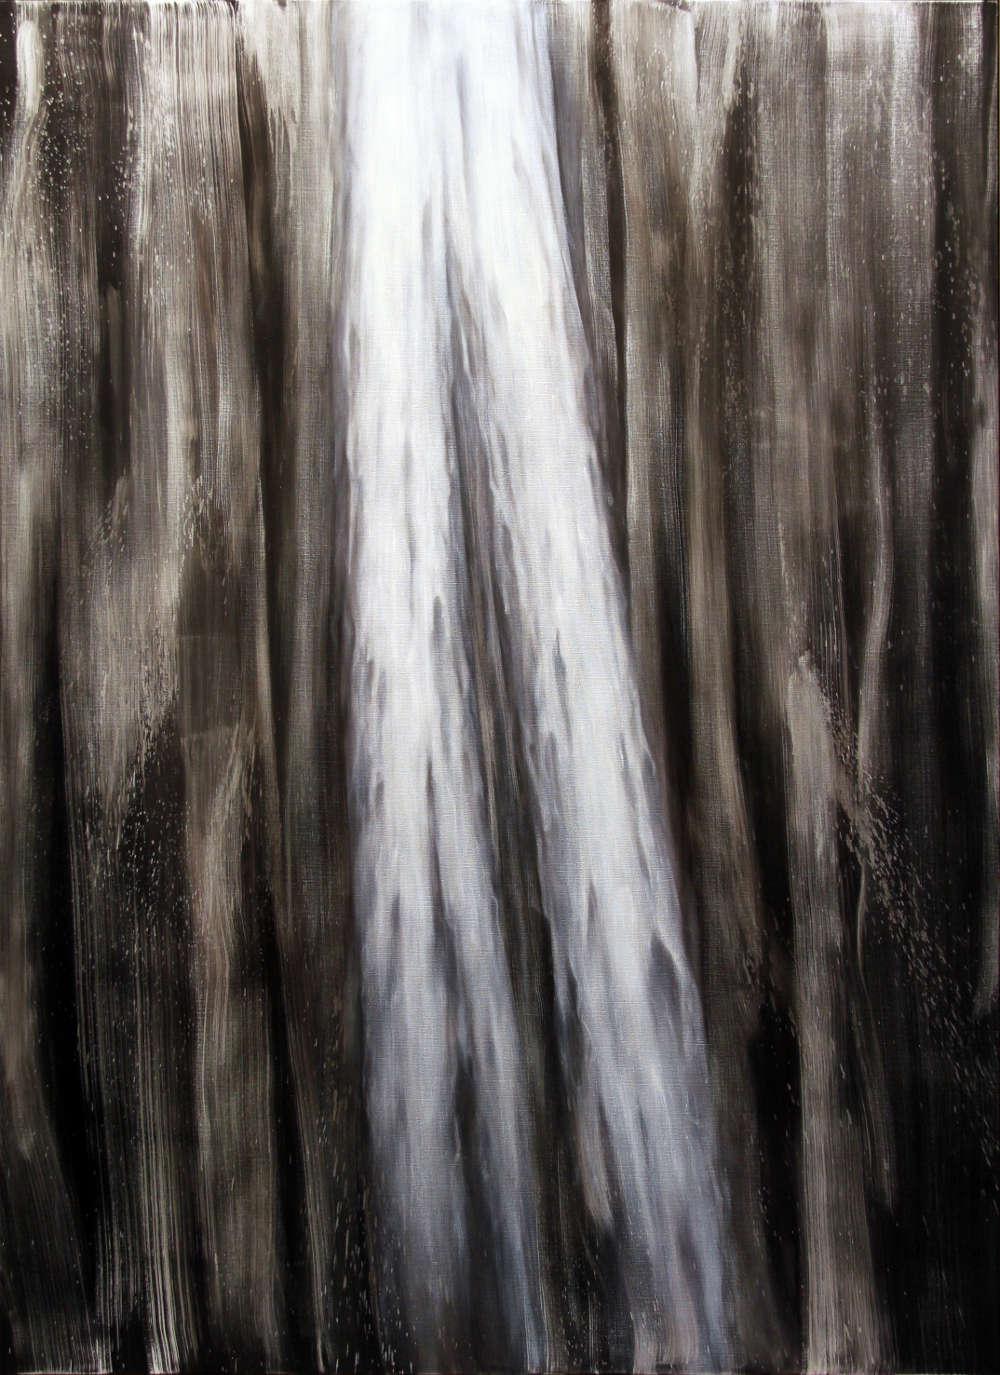 Andrew Browne, Descent, 2018. Oil on linen 240 x 175 cm